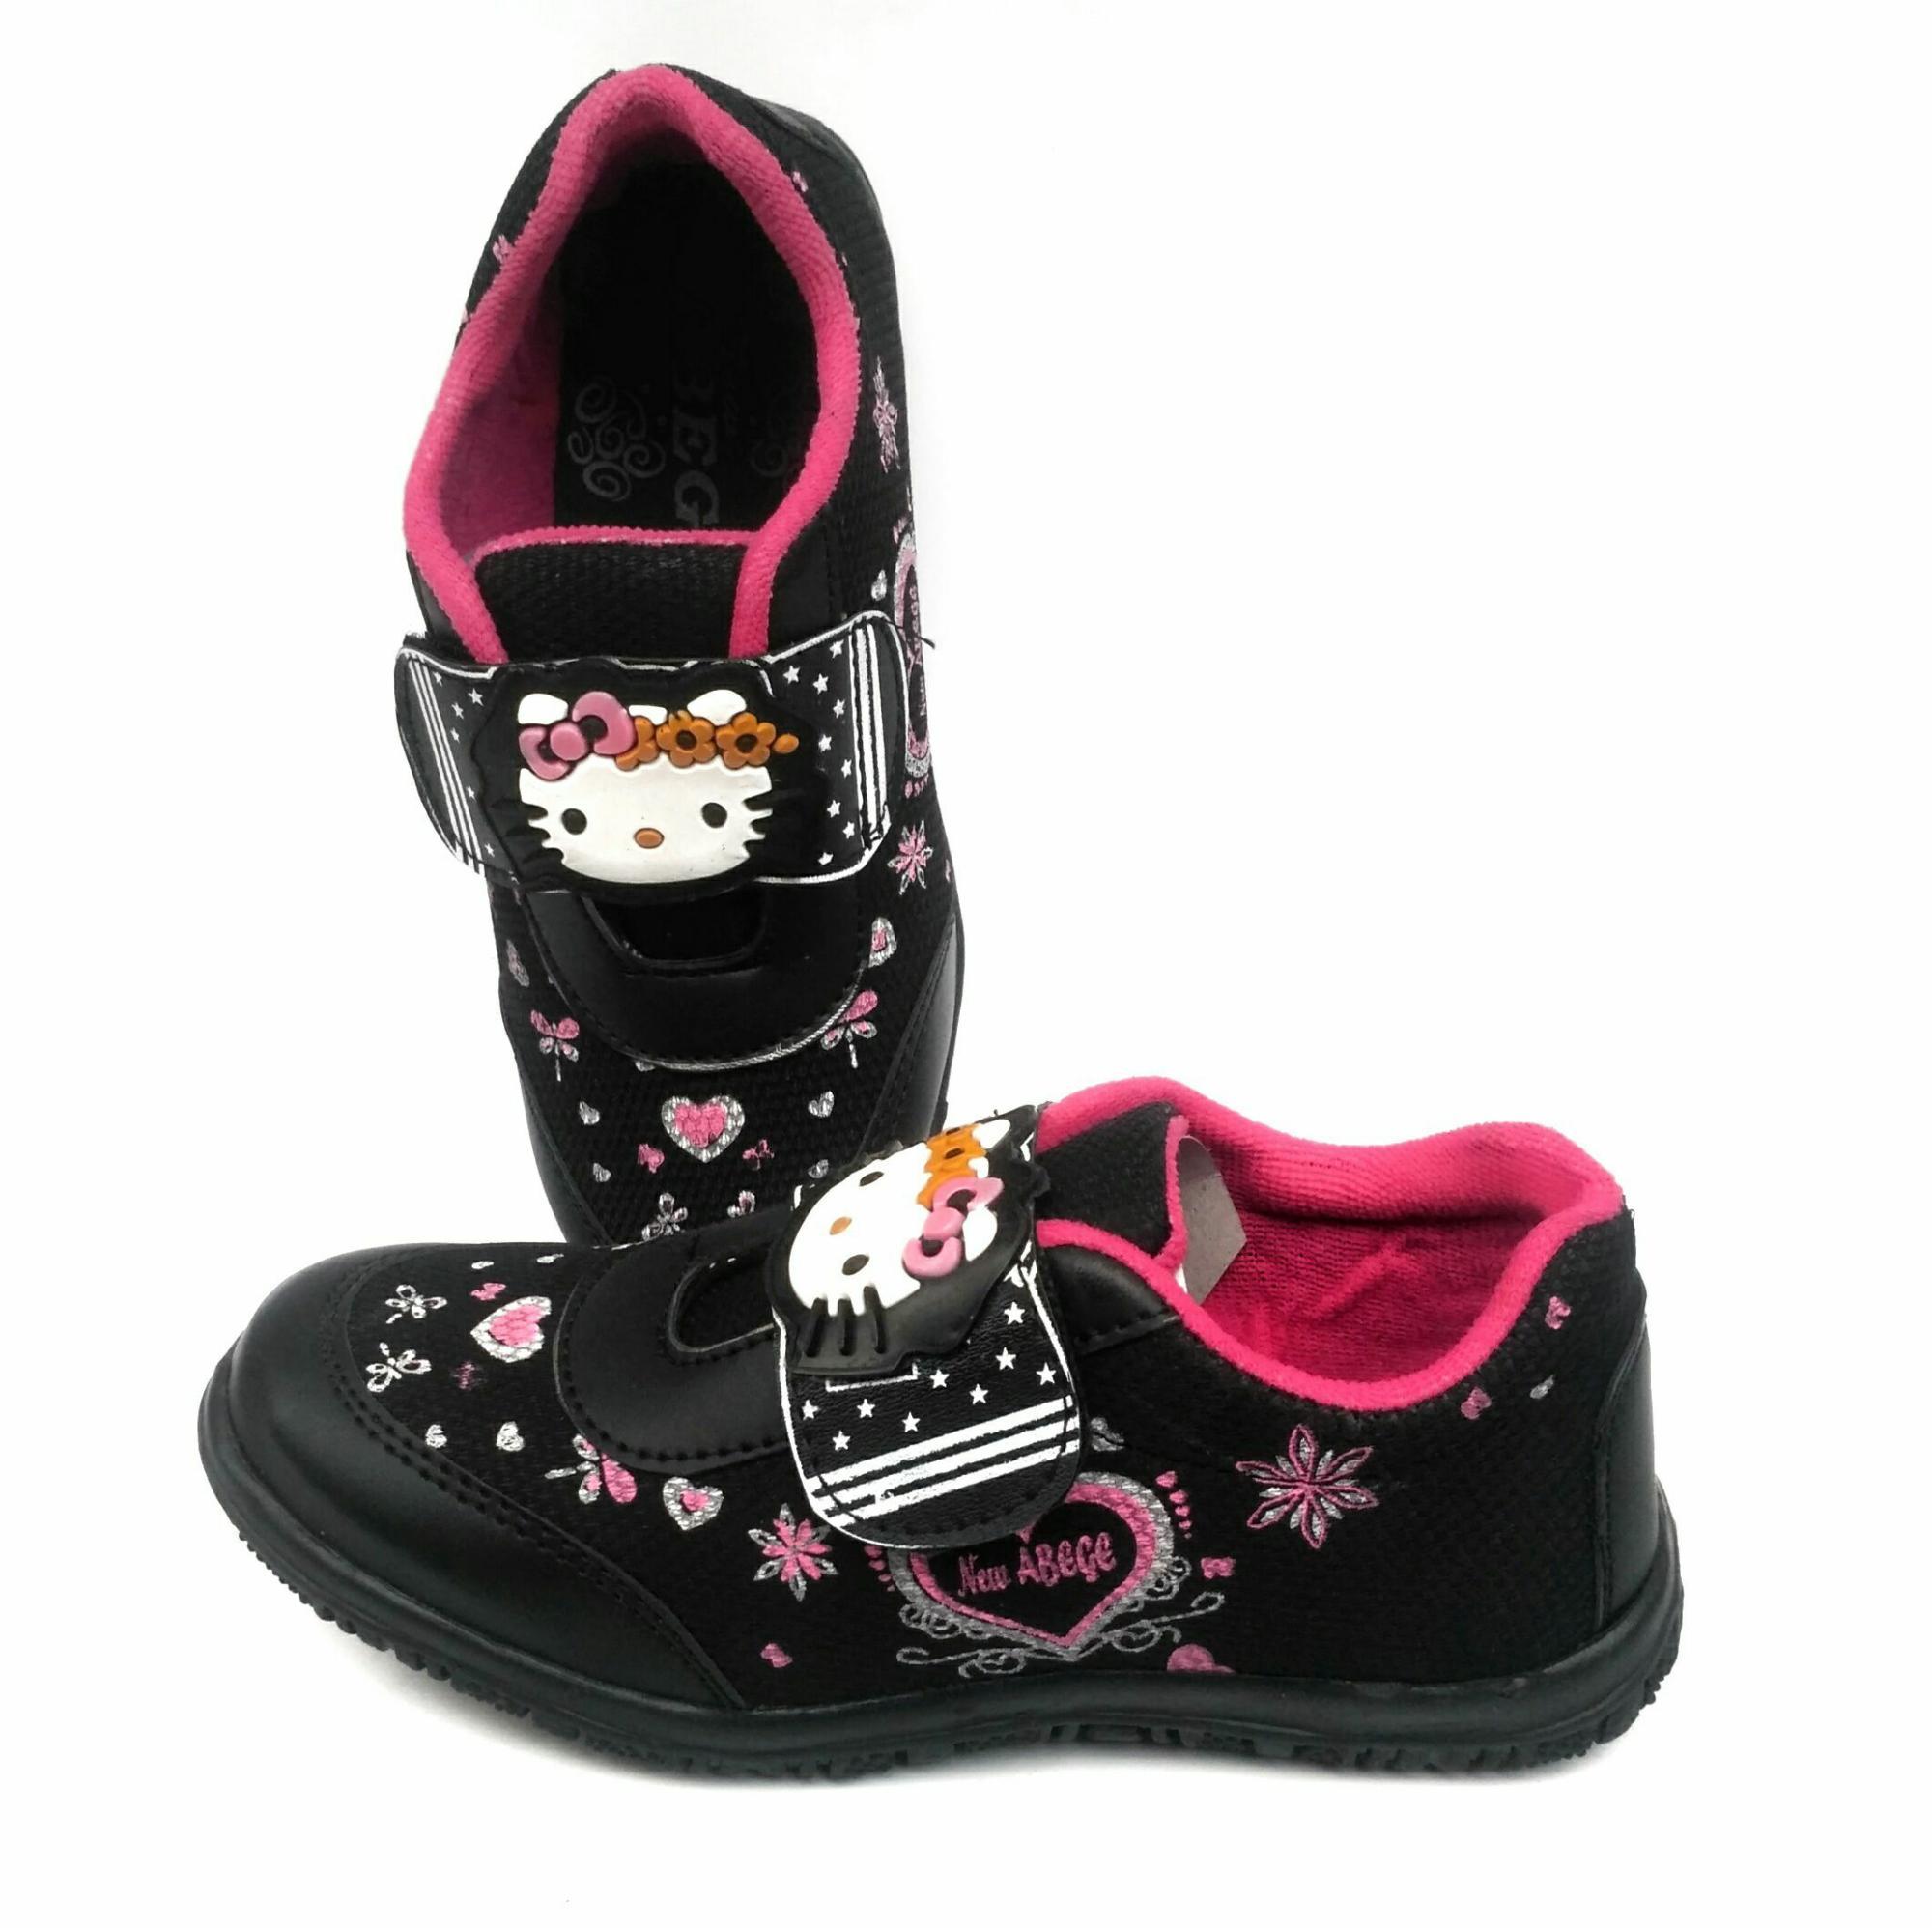 Sepatu Anak Perempuan Lucu Murah Adidas Anaksepatu Sekolah Sooko Sd Hello Kitty Hitam